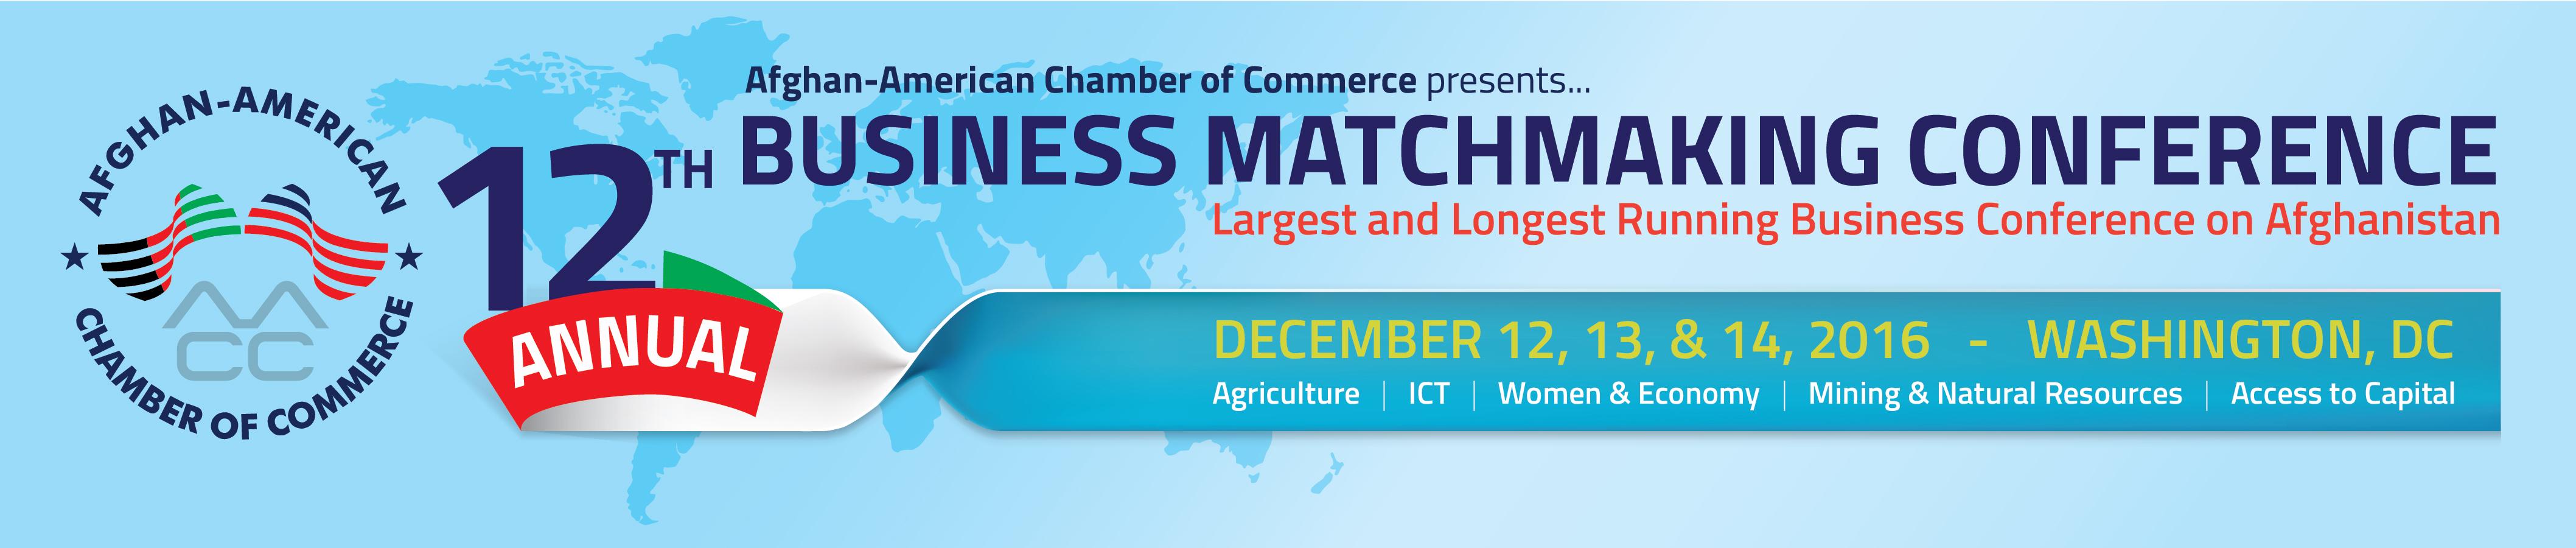 Upcoming Afghanistan Business Conferences: Dubai & Washington D.C.